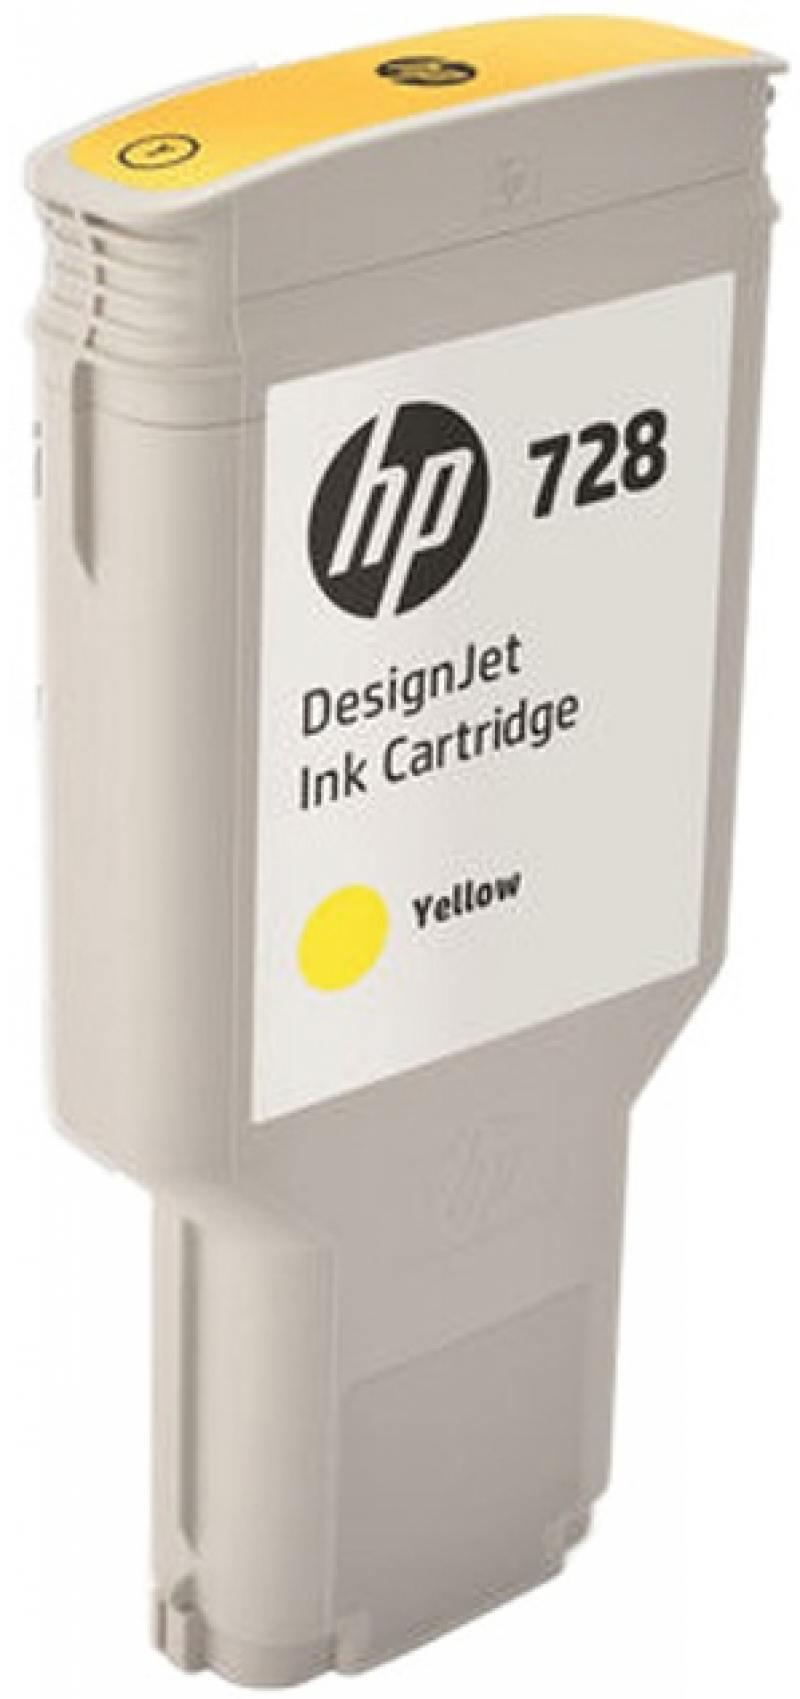 Картридж HP F9K15A (HP 728) для DesignJet T730, T830. Жёлтый. 300 мл. картридж hp 728 f9j65a yellow 130 мл